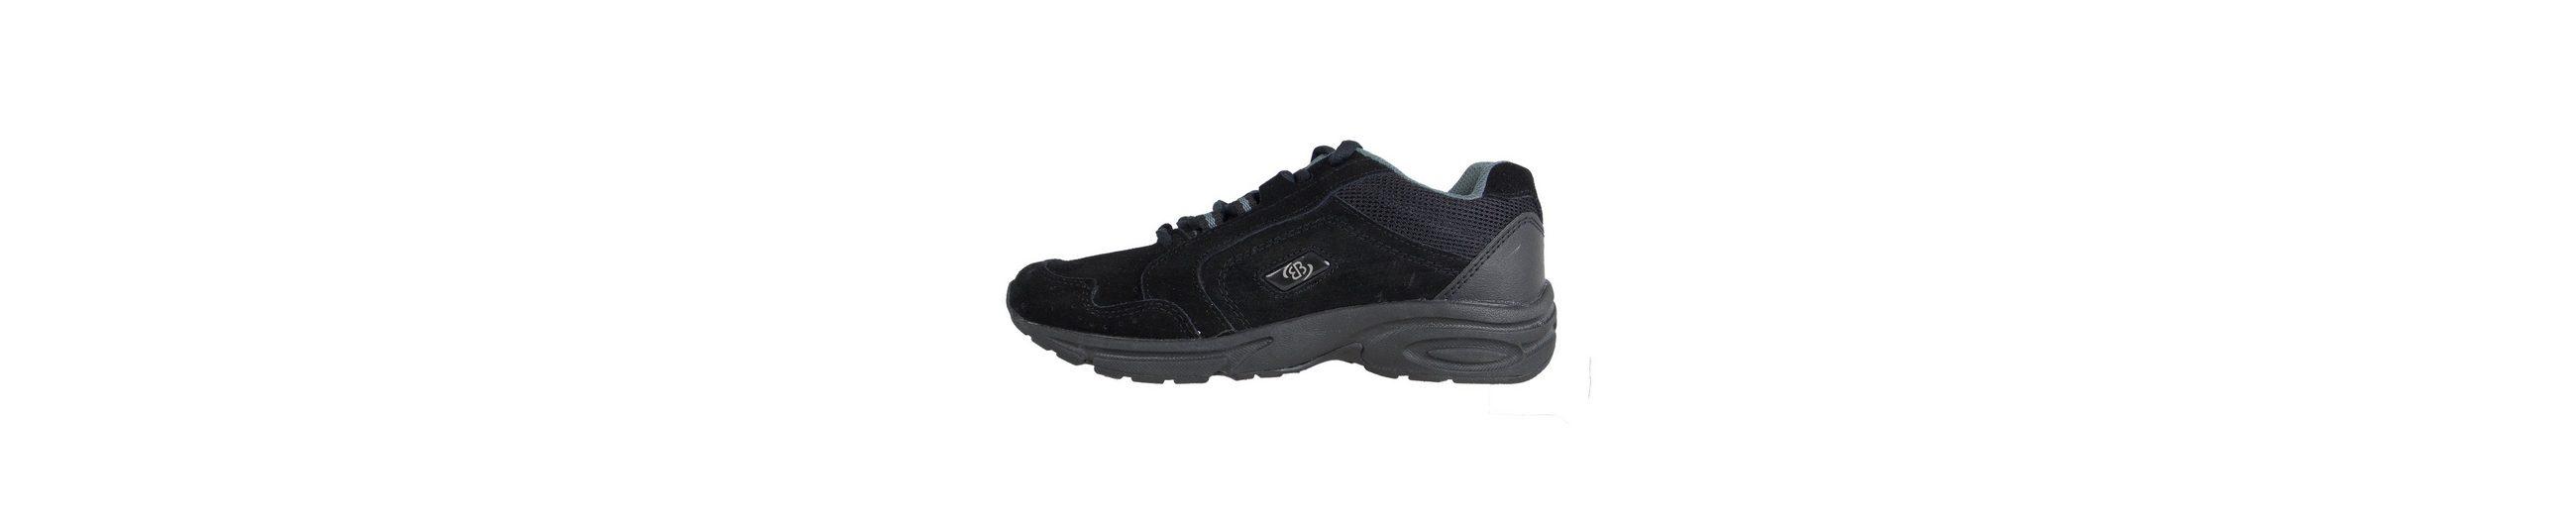 Br眉tting Nordic Walking Schuh mit d盲mpfungsaktiver Laufsohle CIRCLE